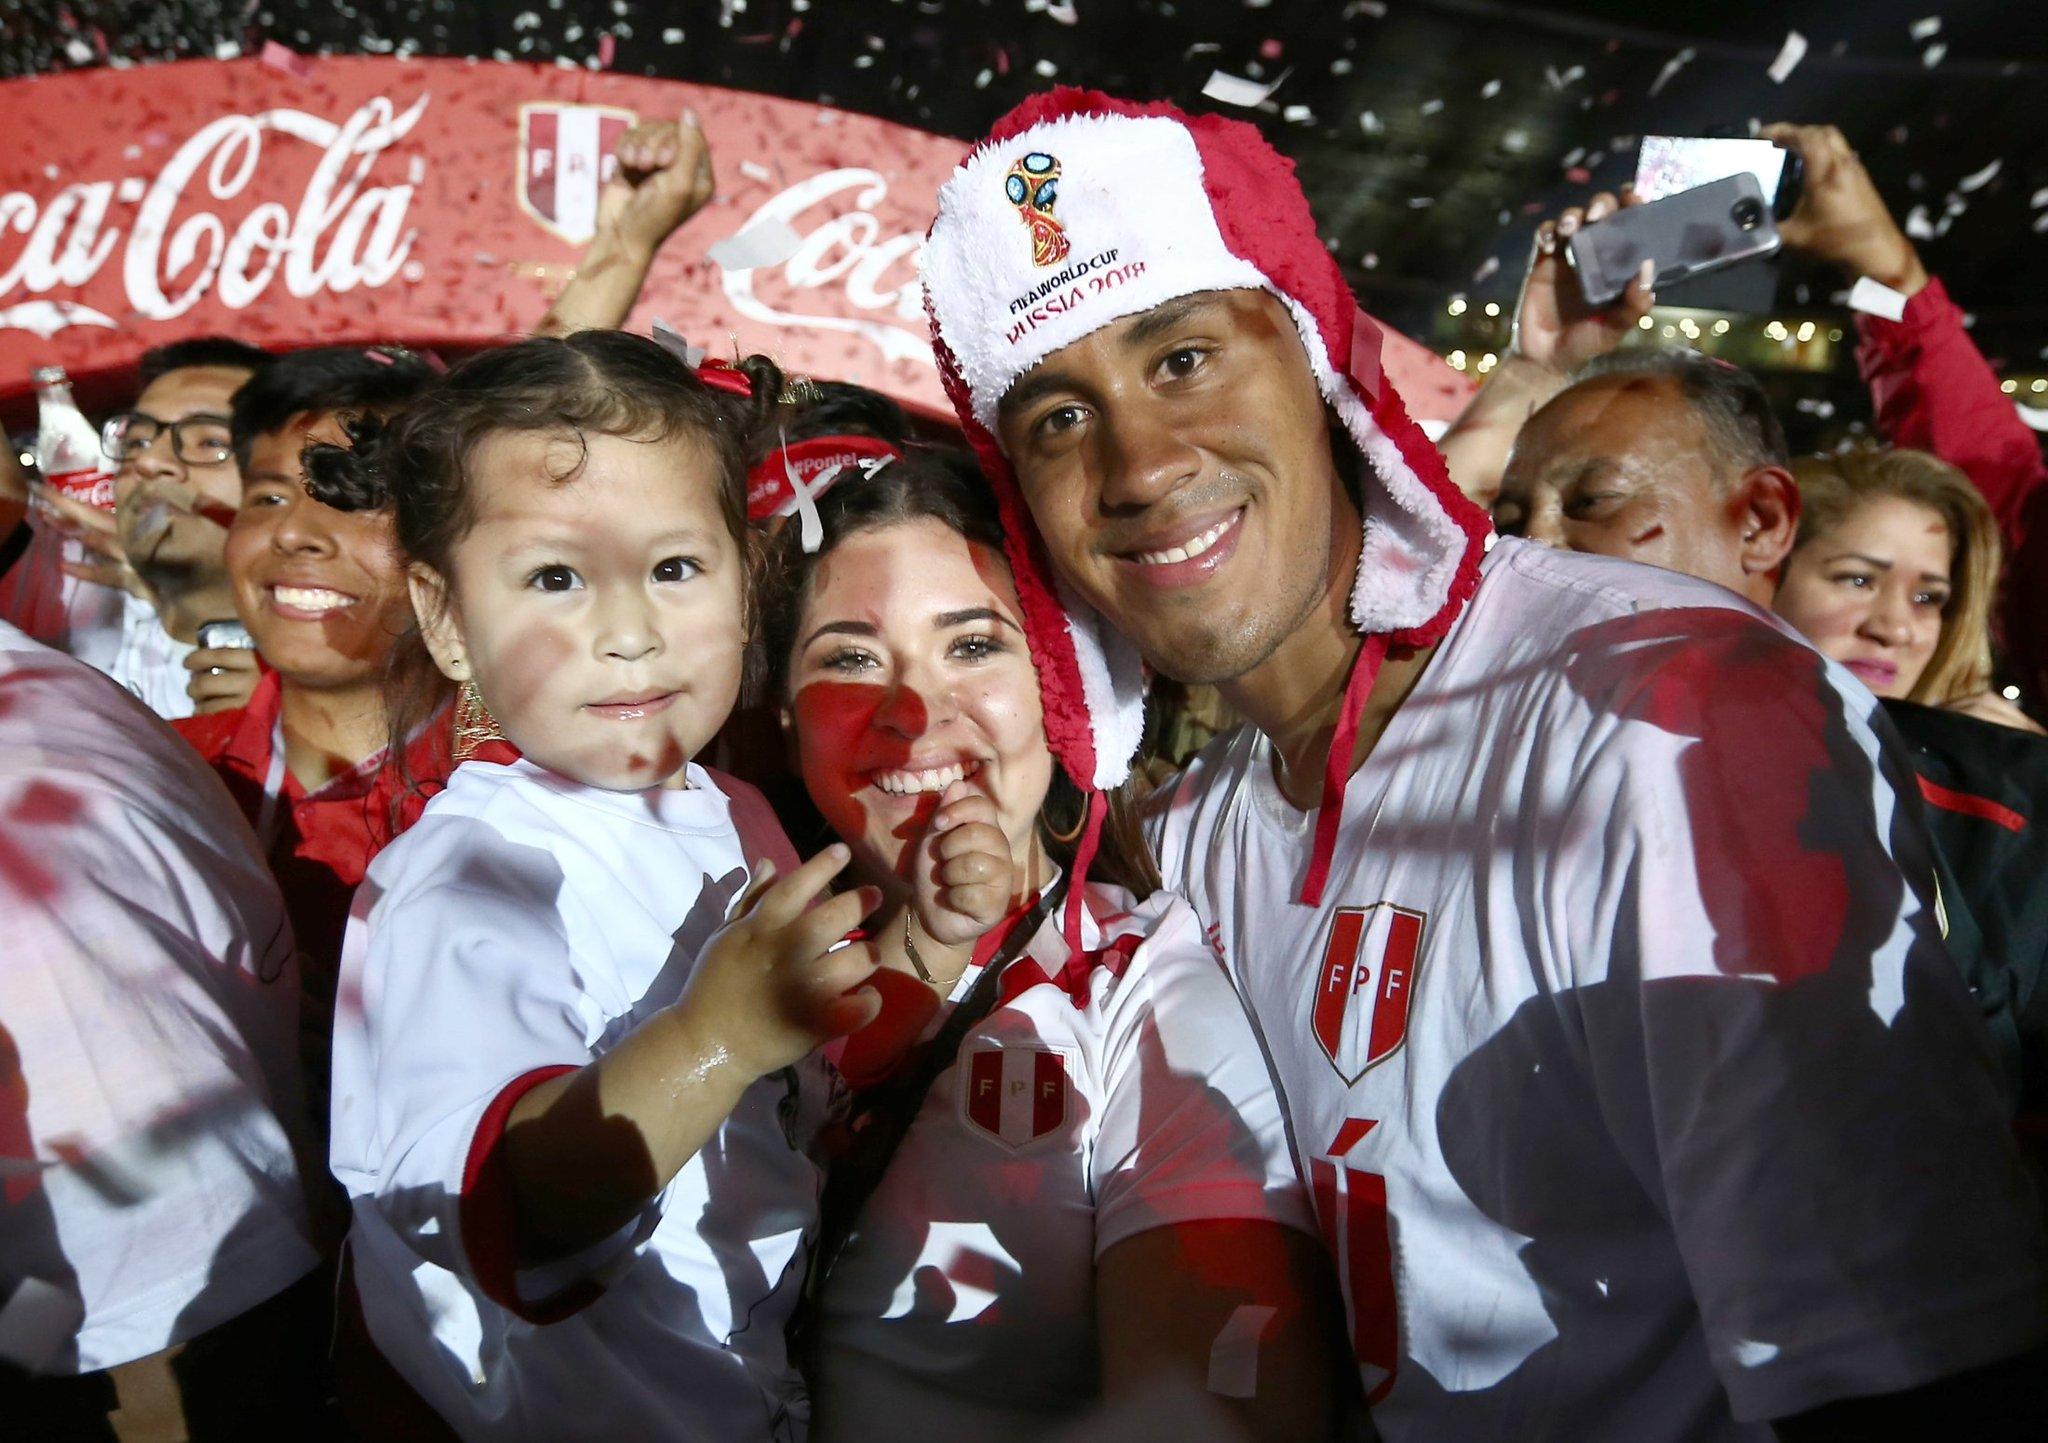 Nice hat, @renatotapiac ������ #WorldCup https://t.co/DR3Sm2Wbia